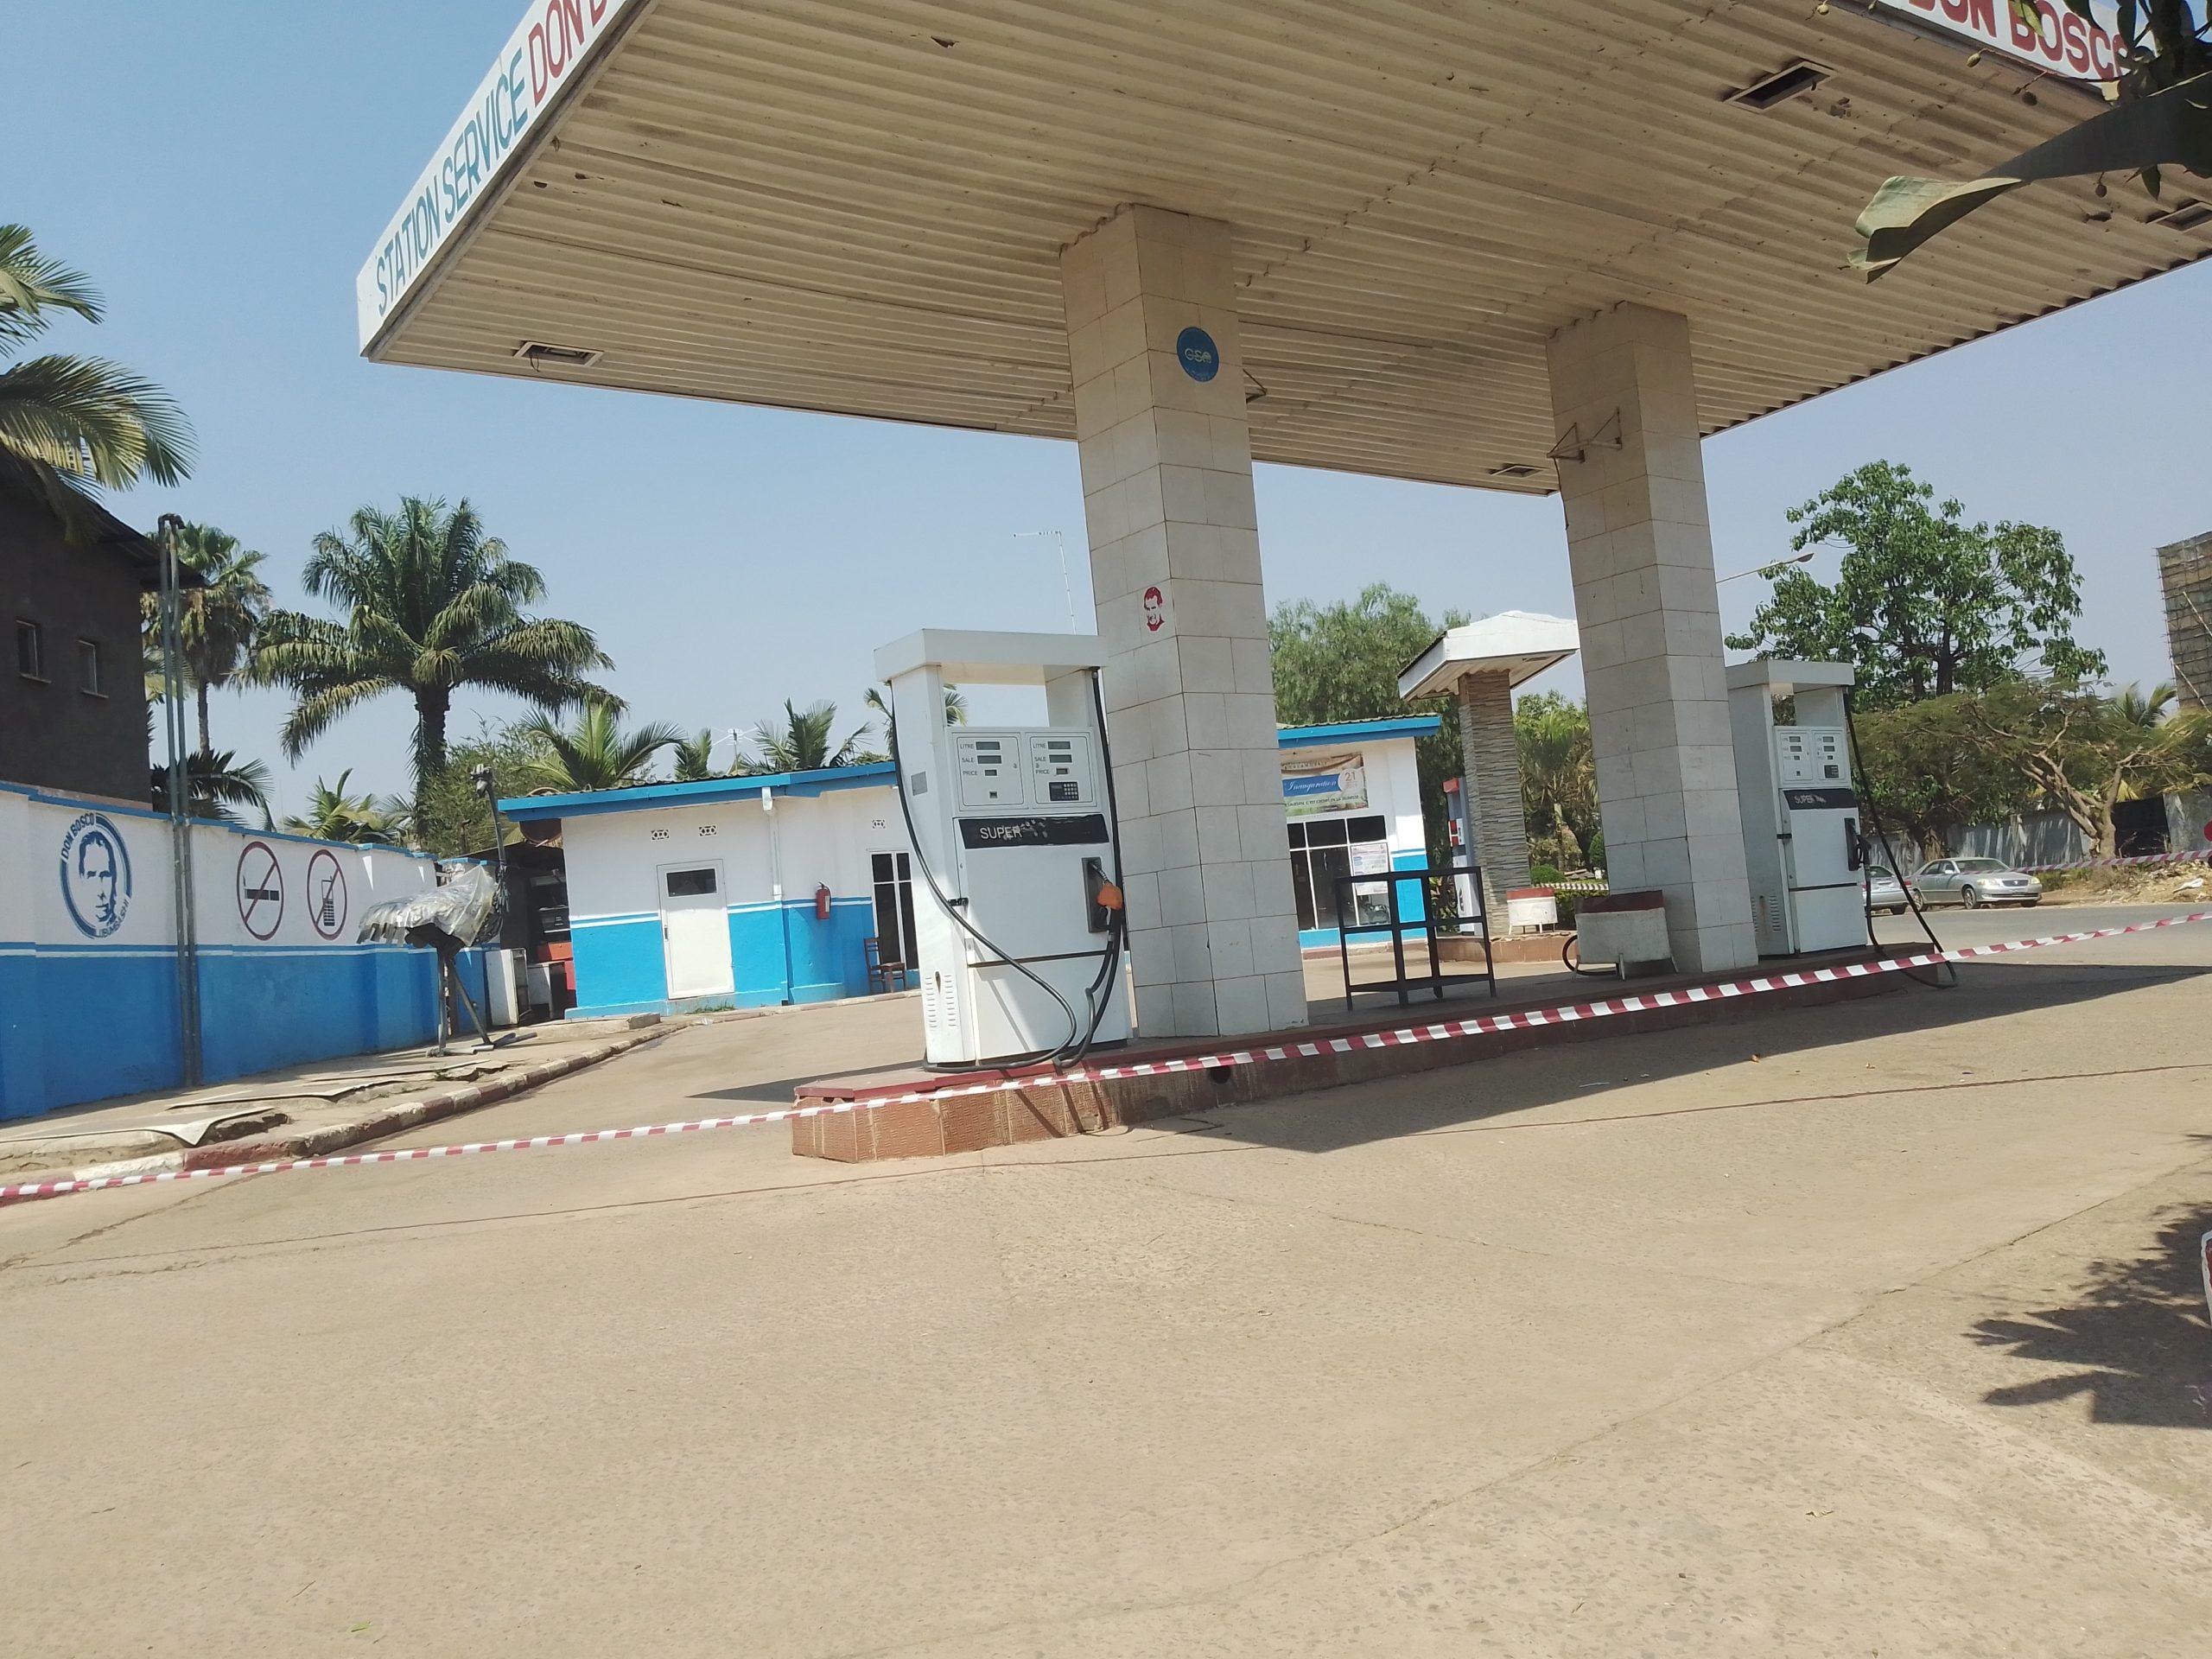 Station d'essence Don Bosco à Lubumbashi. Photo crédit : Trésor TSHILUMBA